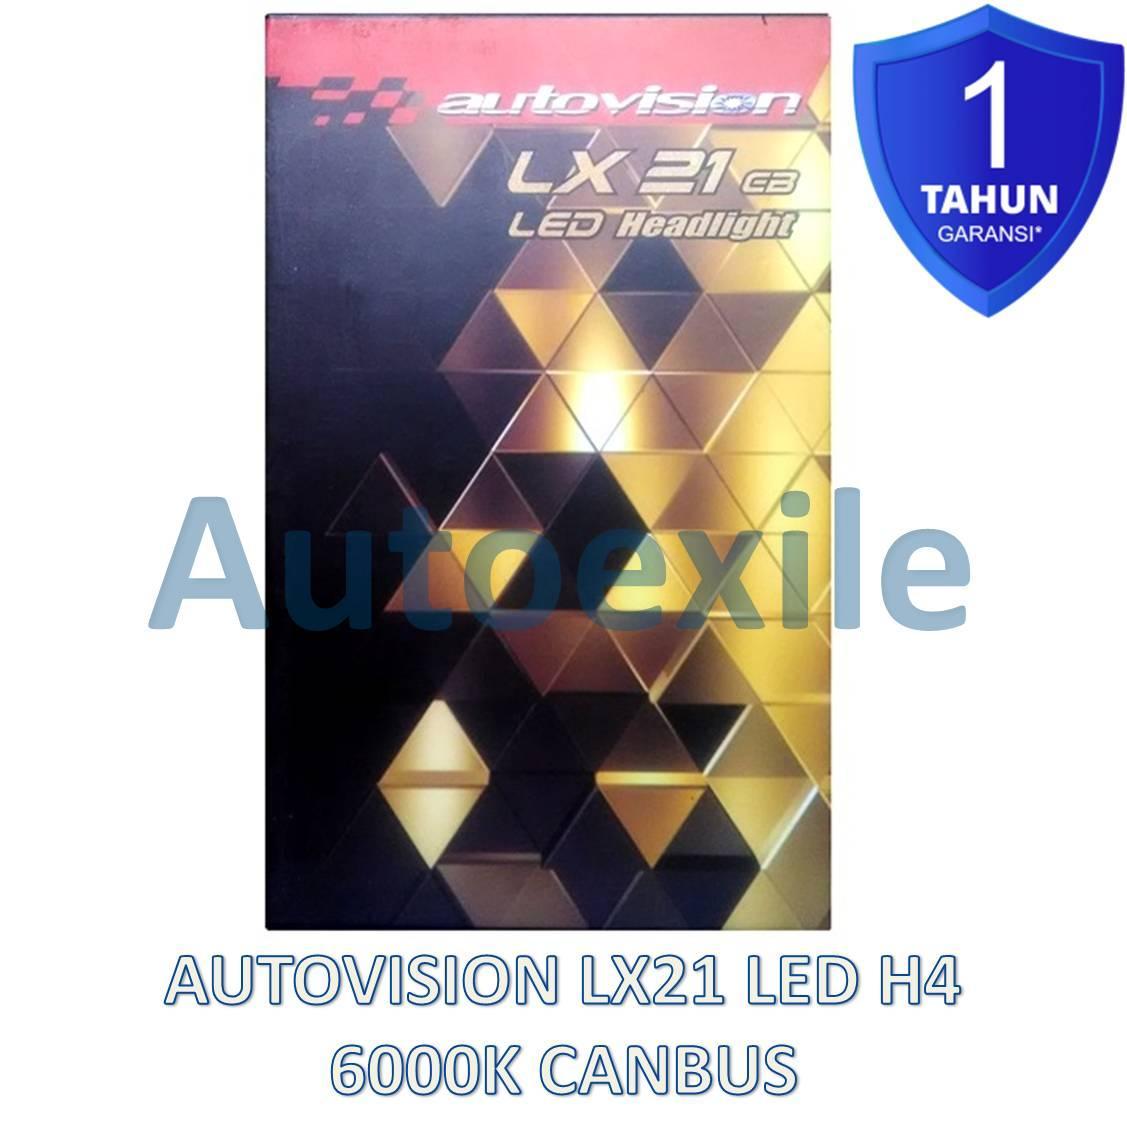 Autovision LX21 CB LED H4 H/L 21W 6000K Putih Luxeon Z ES Canbus LX-21 Lampu Mobil Garansi APV Avanza Agya Ayla CRV Ertiga HRV Innova Jazz SX4 Xenia Xpander